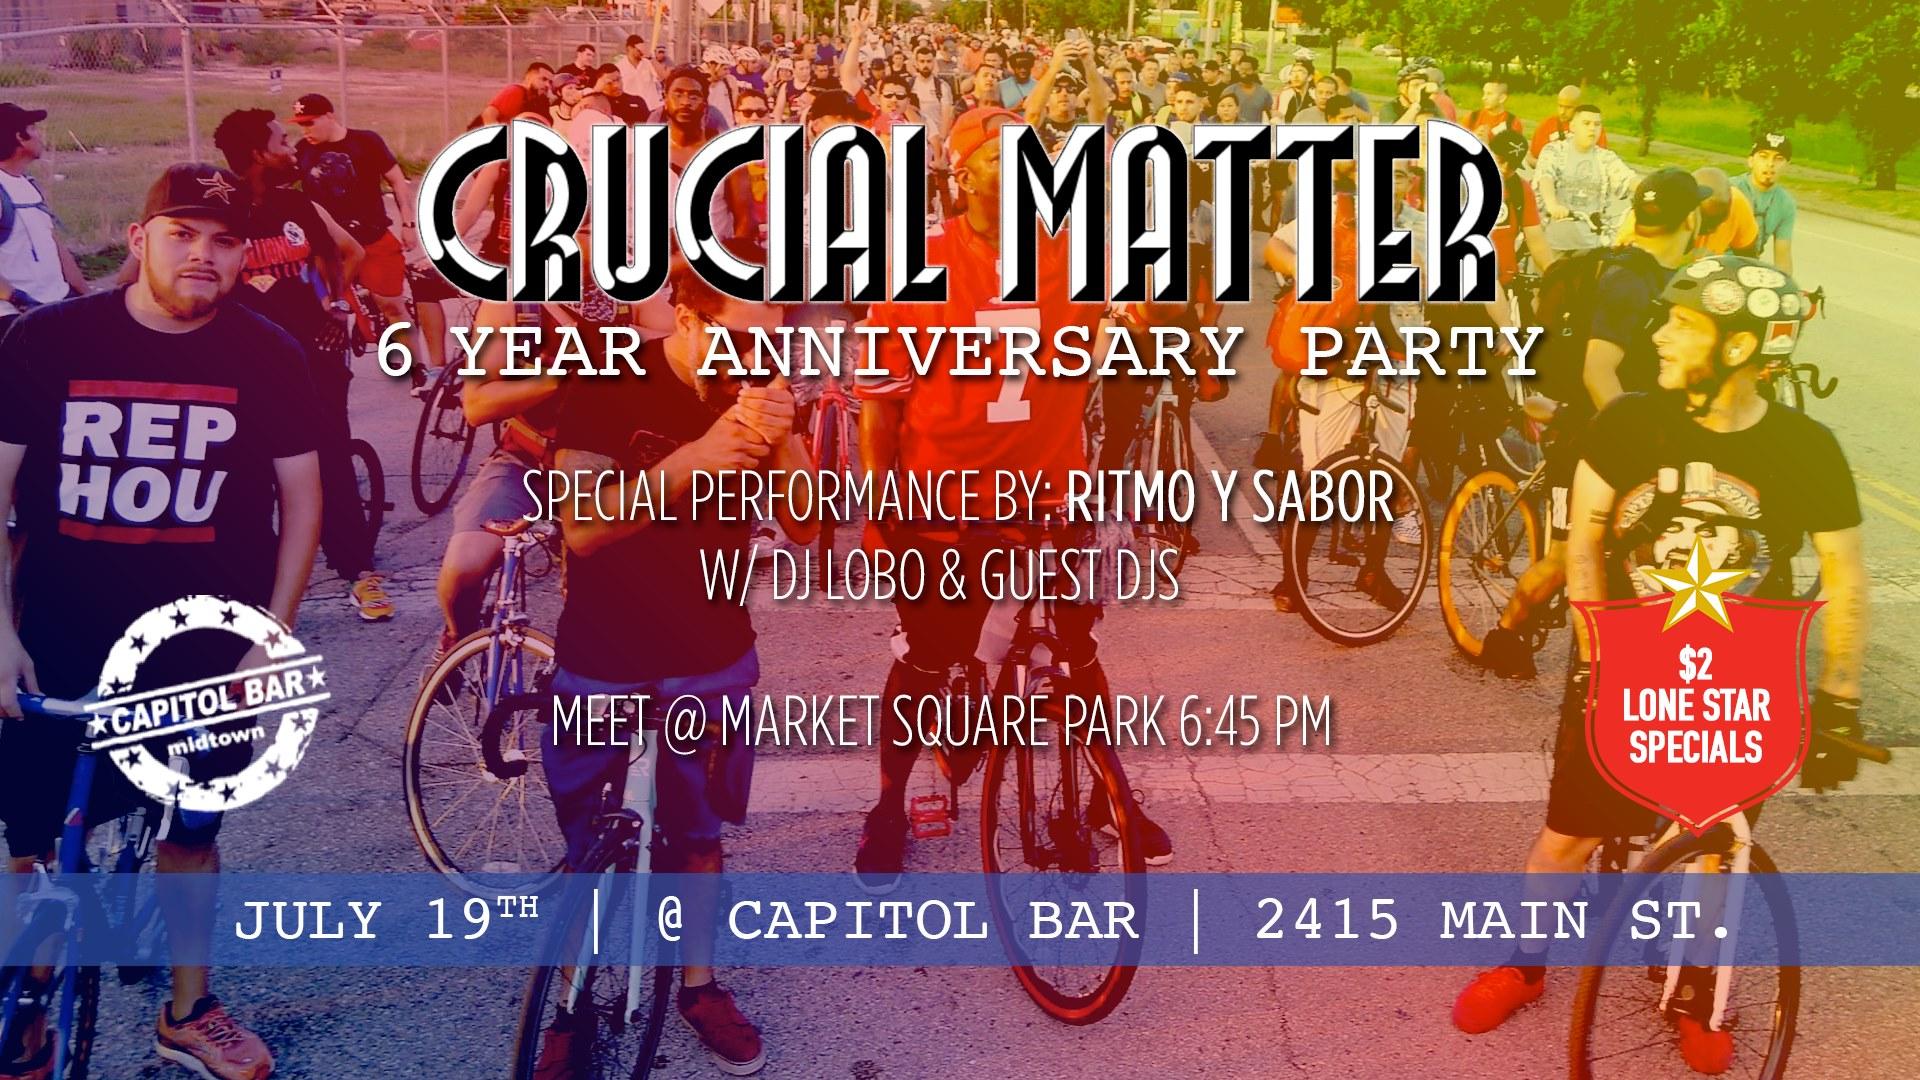 Crucial Matter Bike ride